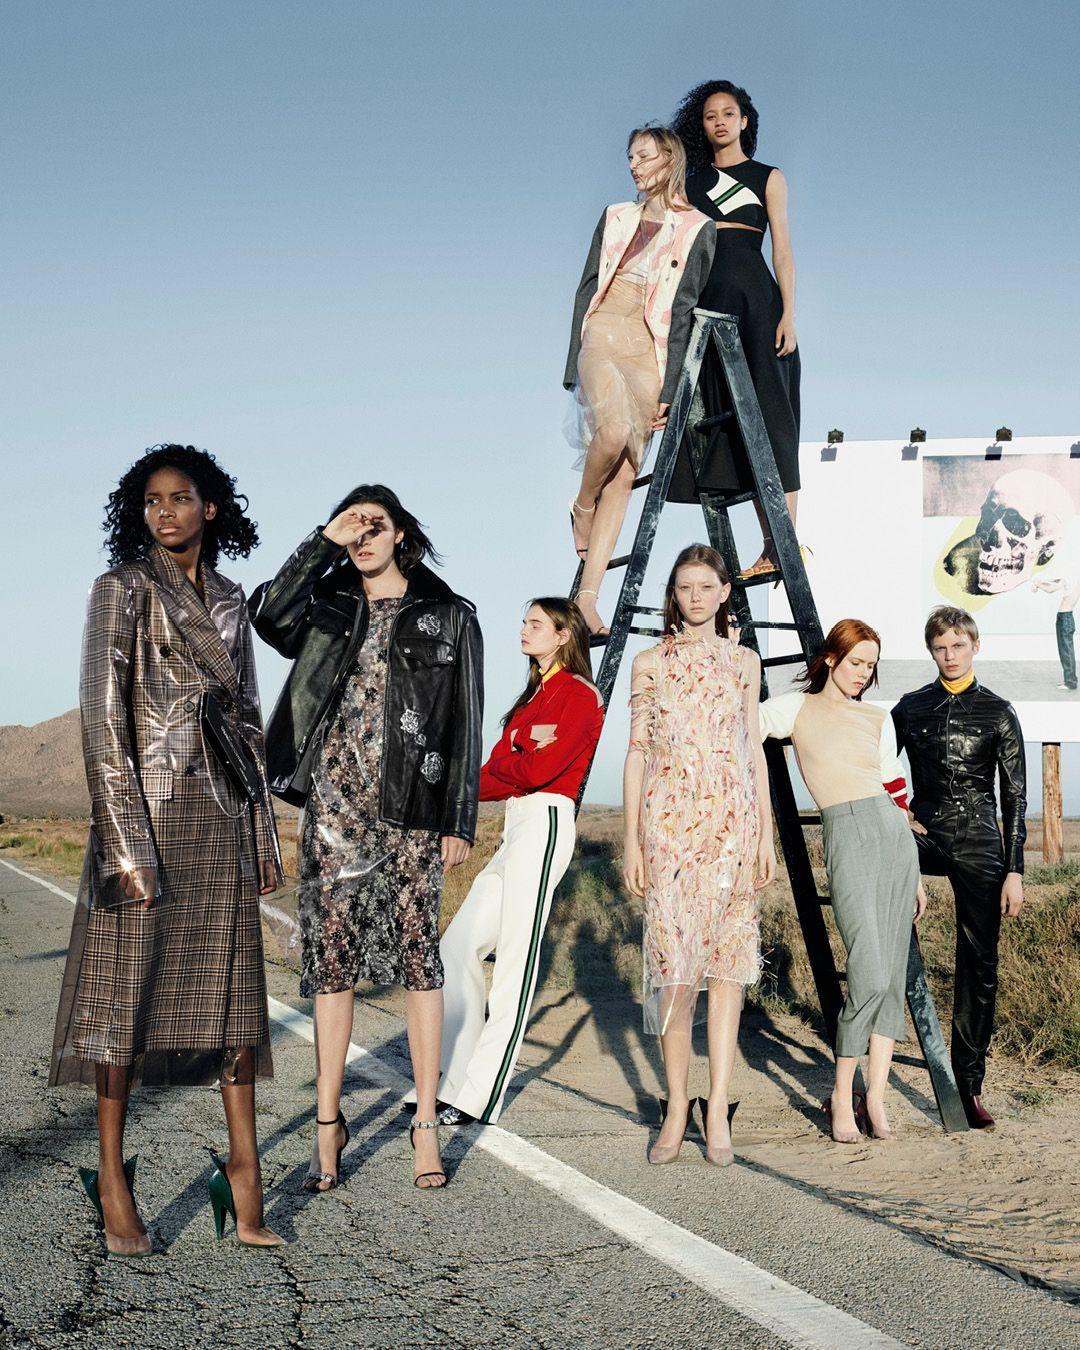 NTK Kevin Carrigan sẽ thay thế NTK Raf Simons tại Calvin Klein? 6